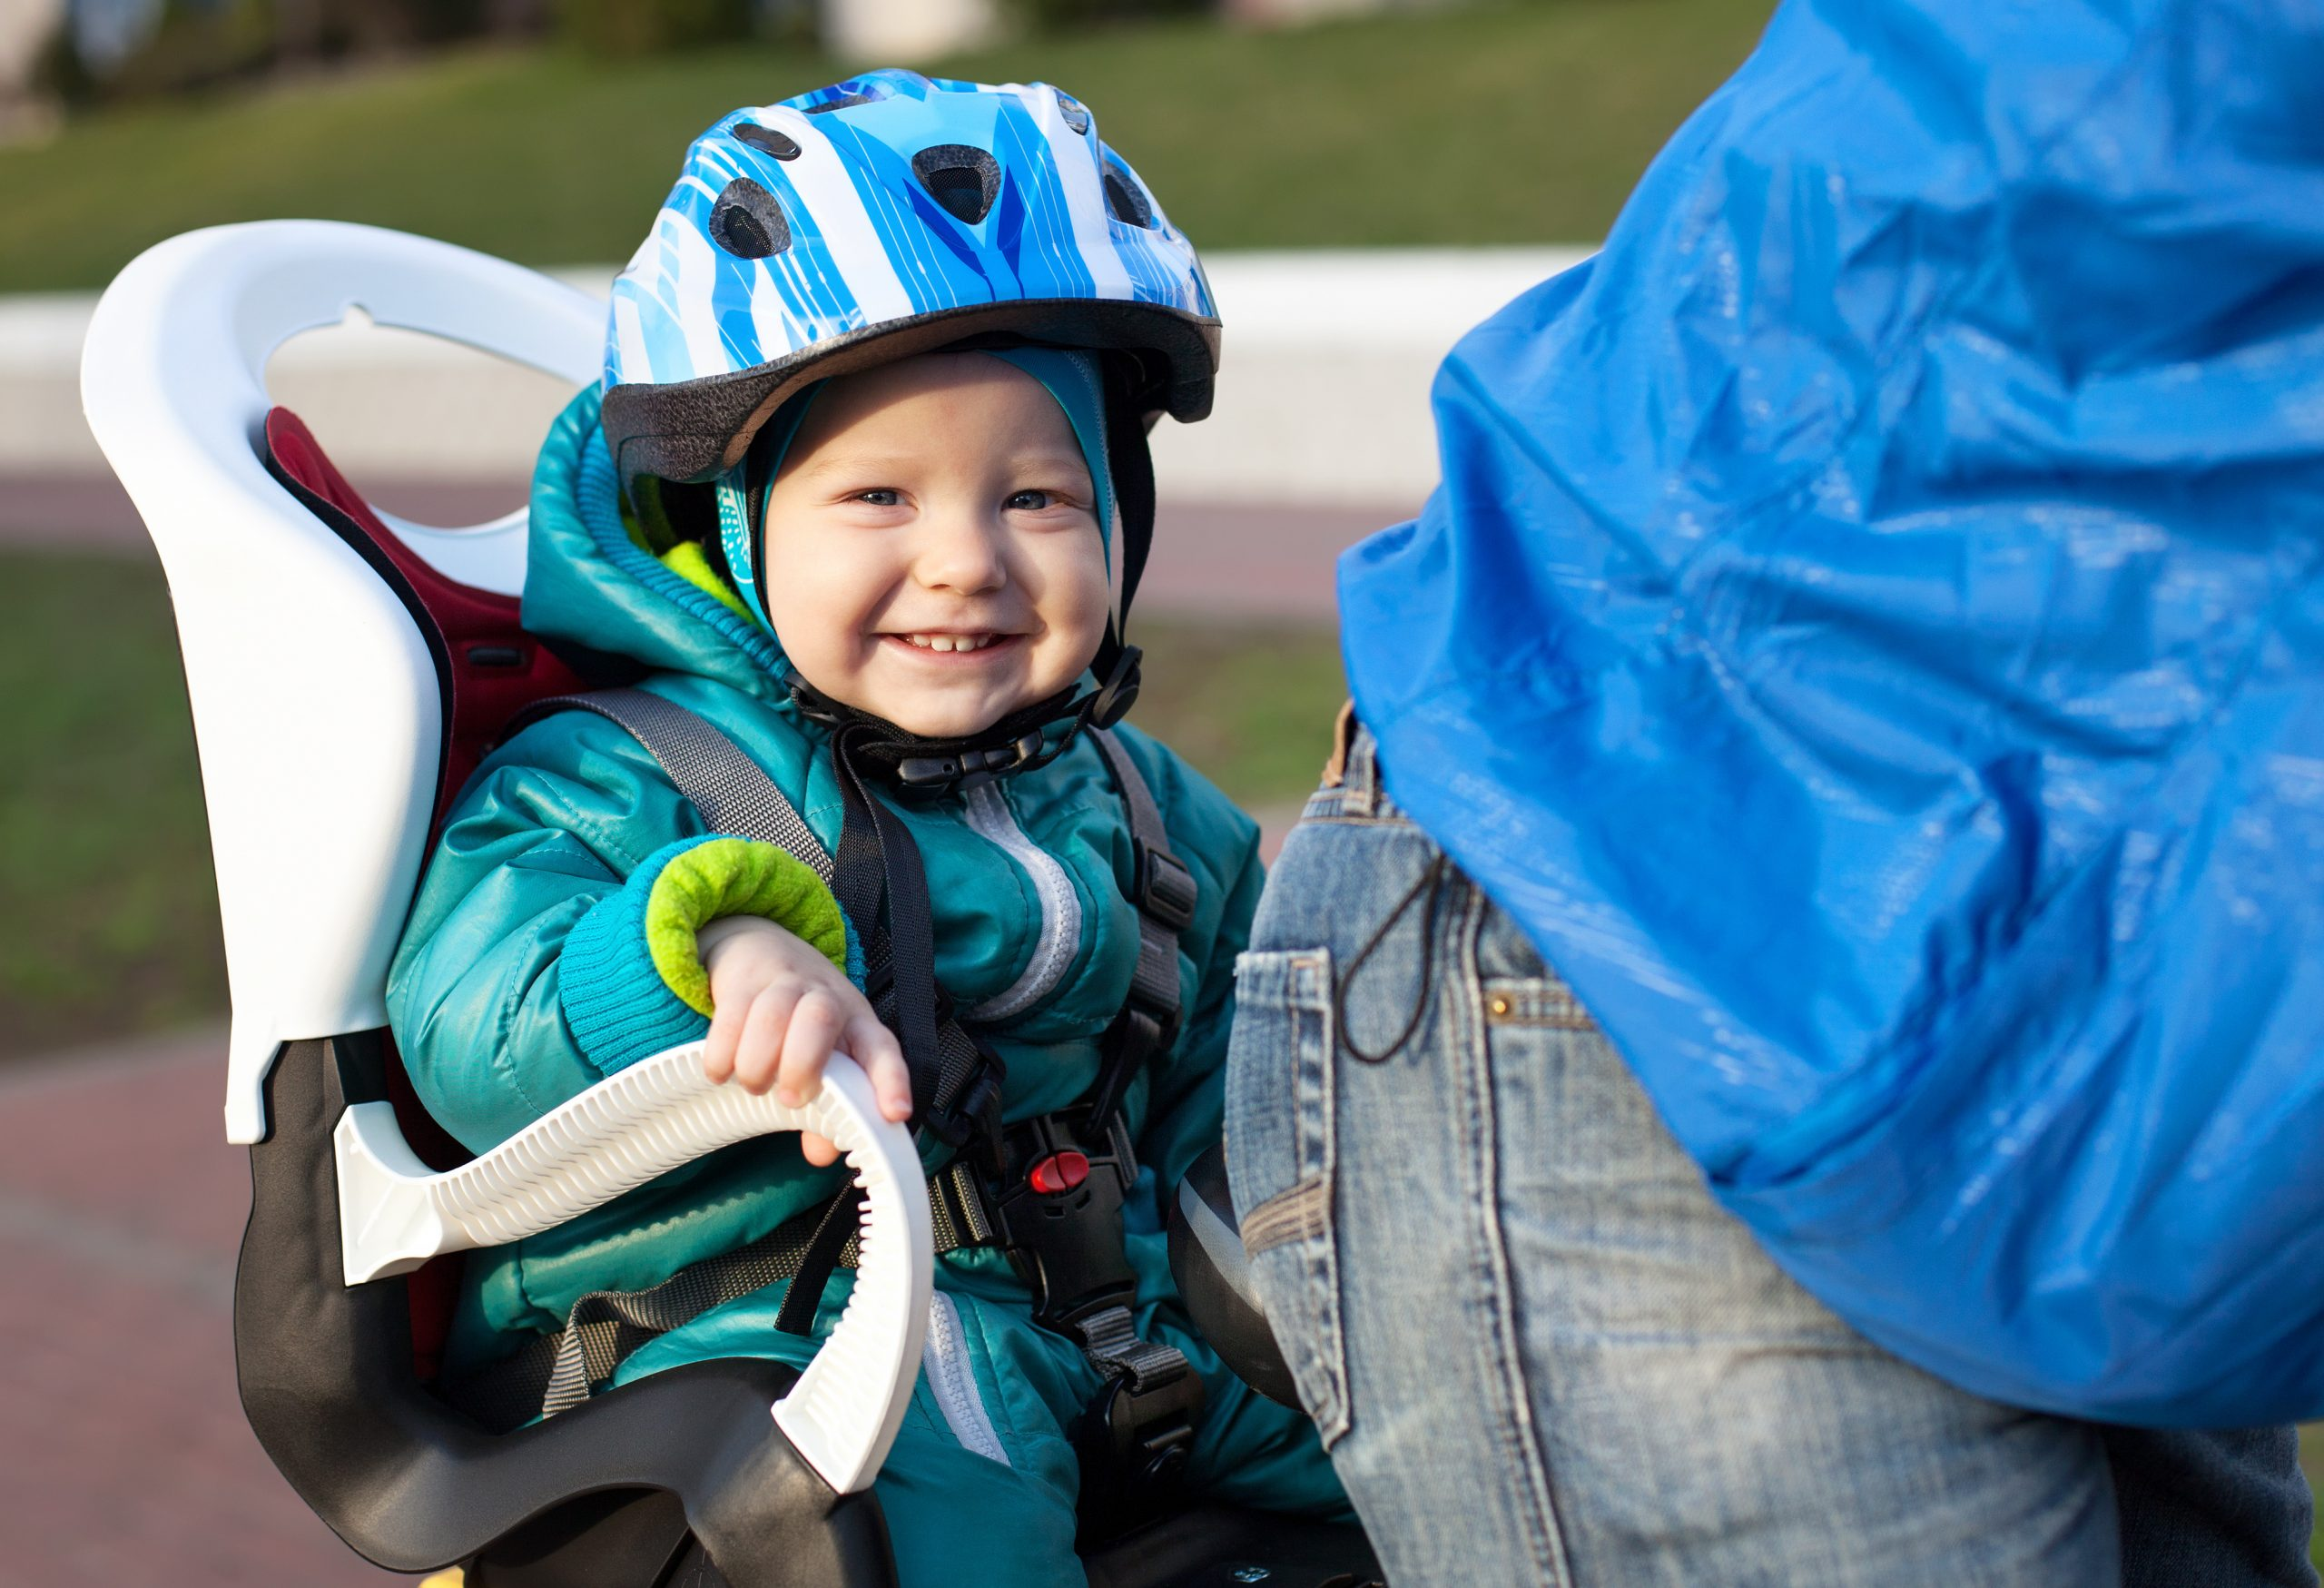 Sillas portabebés para bicicletas